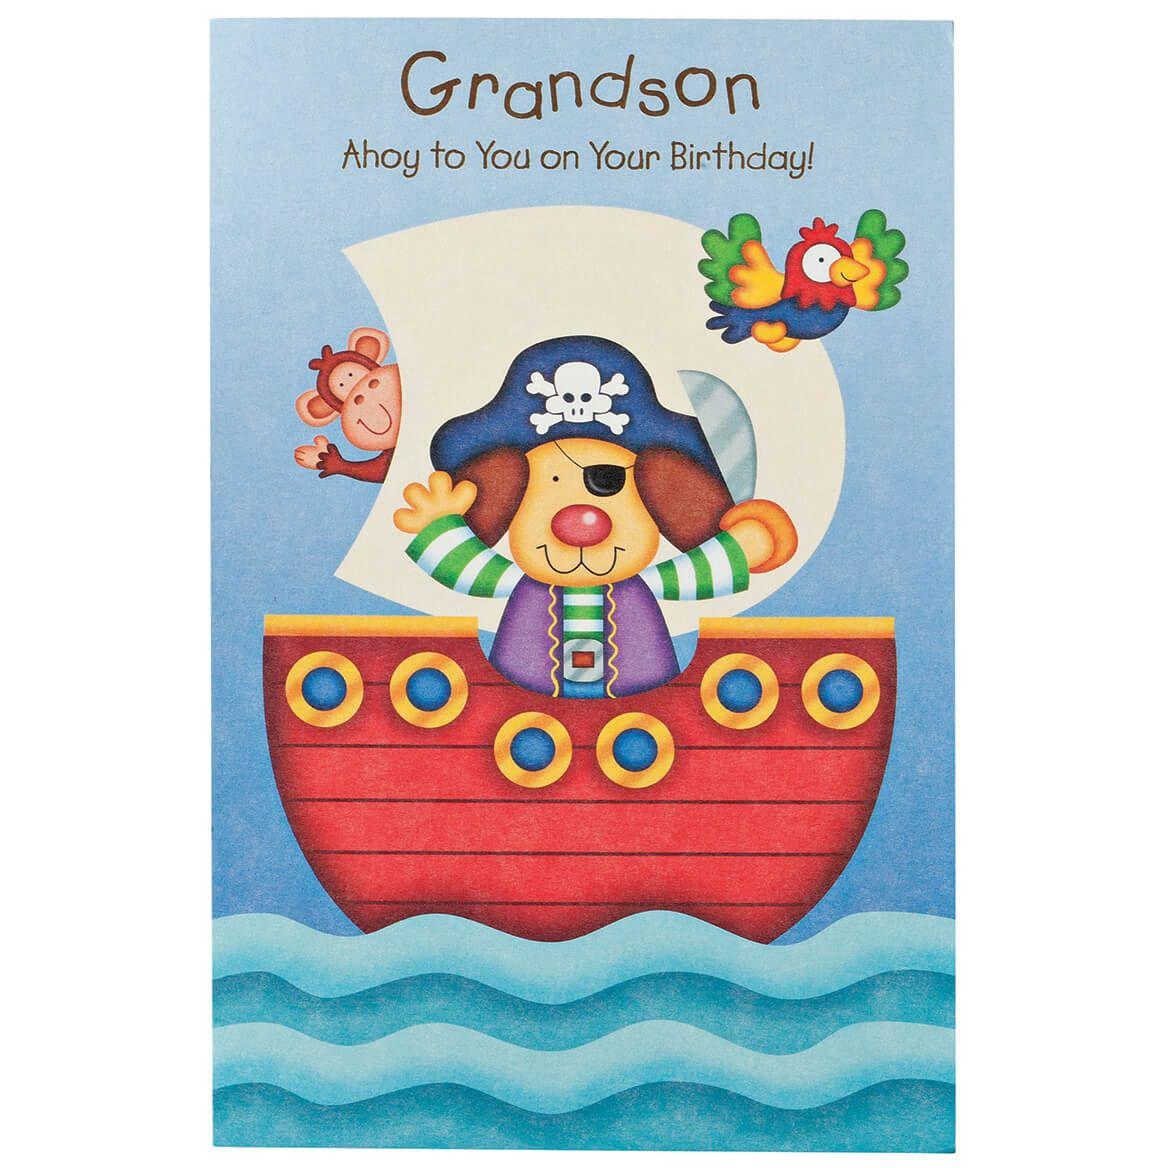 Children's Birthday Cards Value Pack of 20-344890